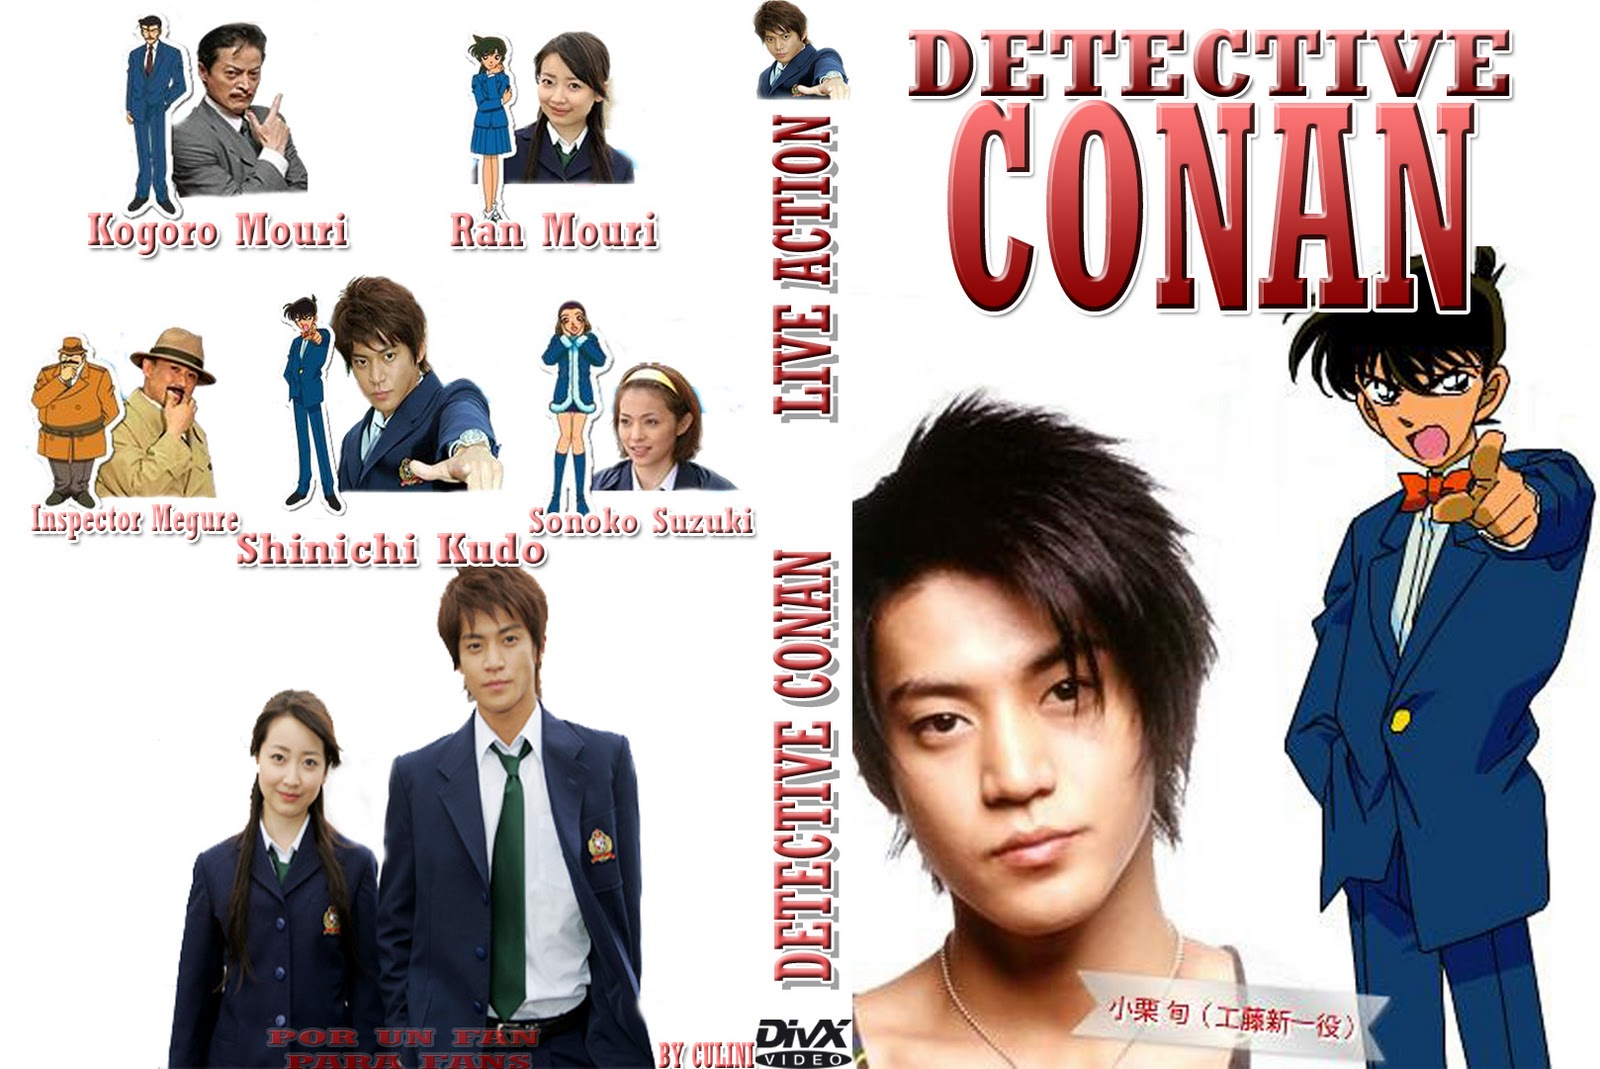 DETECTIVE CONAN LIVE ACTION 1